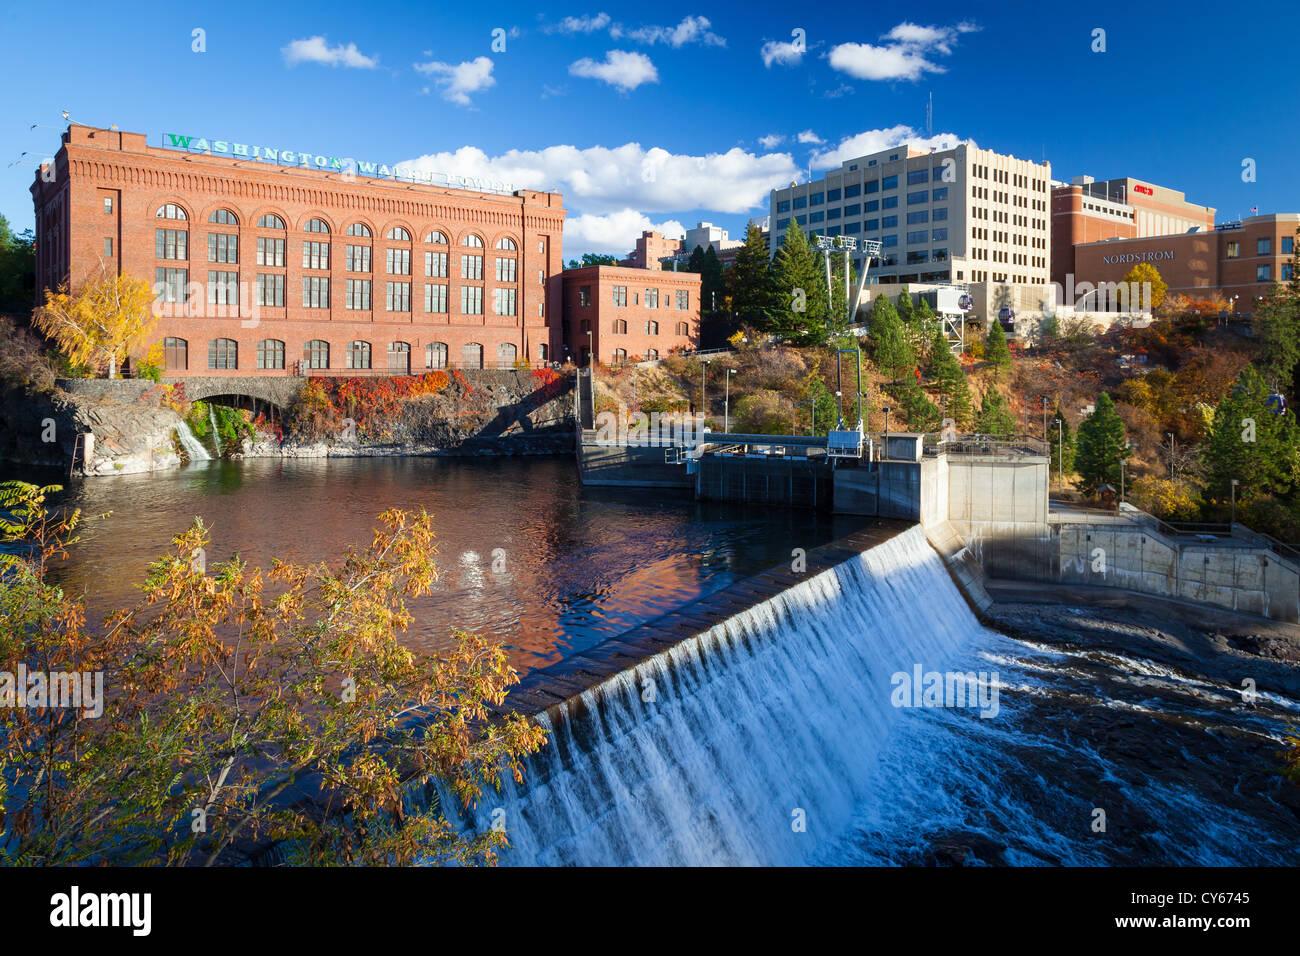 Spokane River in Spokane, Washington - Stock Image